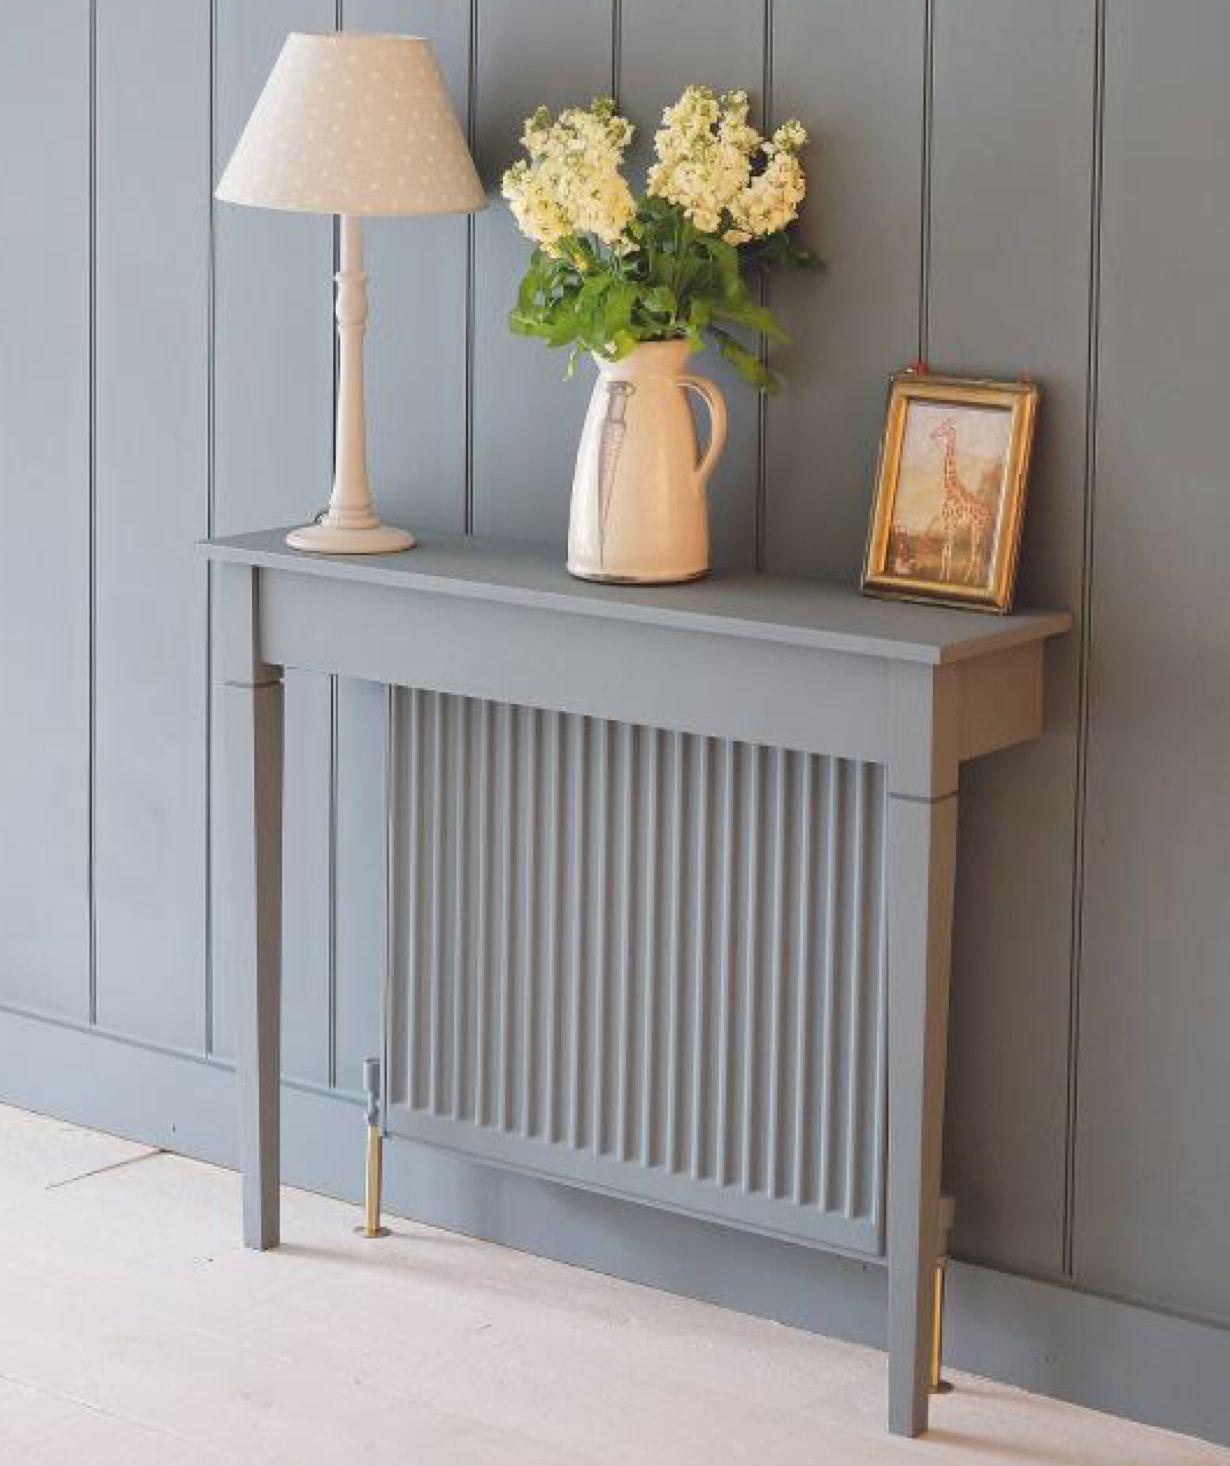 Radiator Table Good Idea For Narrow Hallway Hallway Decorating Narrow Hallway Decorating Hallway Inspiration